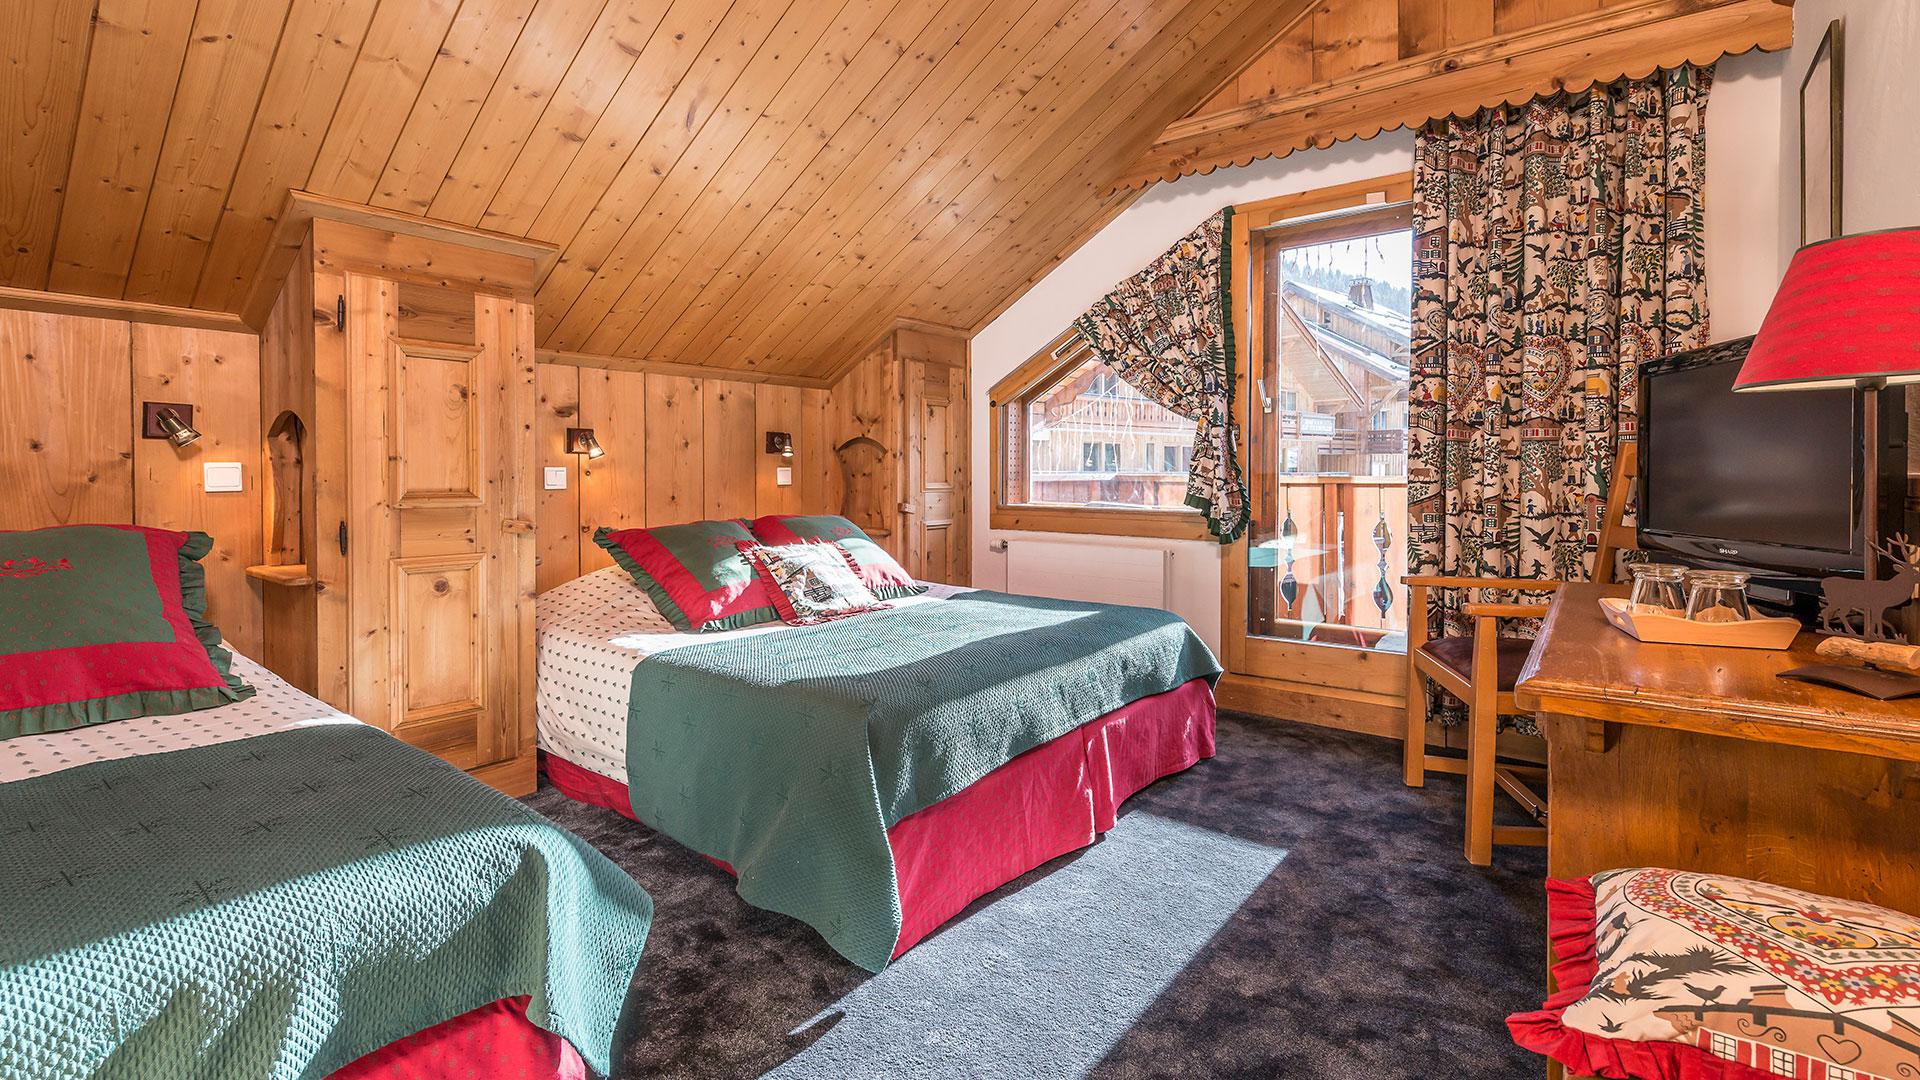 Chambre triple hôtel 3 étoiles alpes